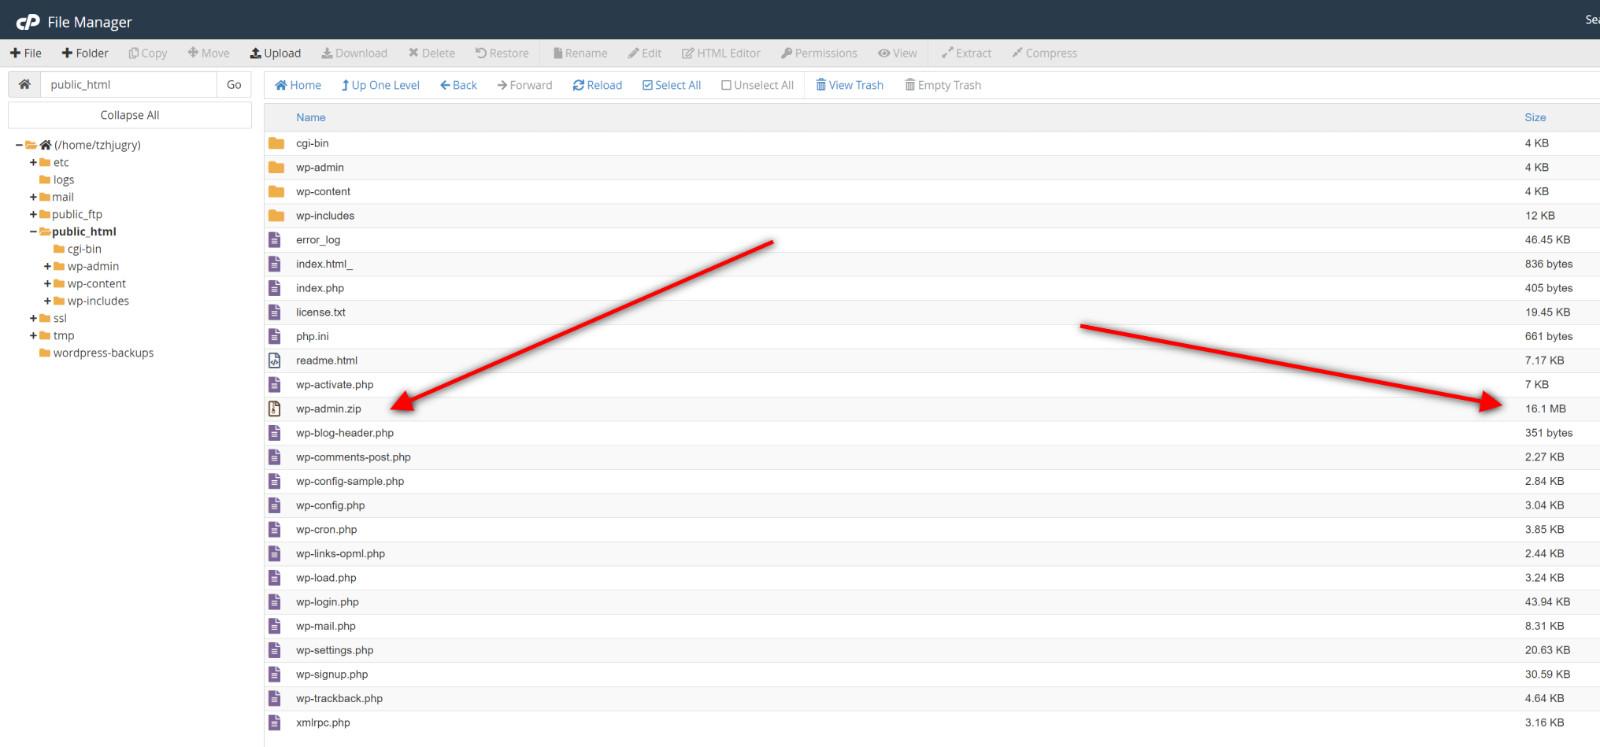 Wordpress Backup Cpanel Download Website Files 1